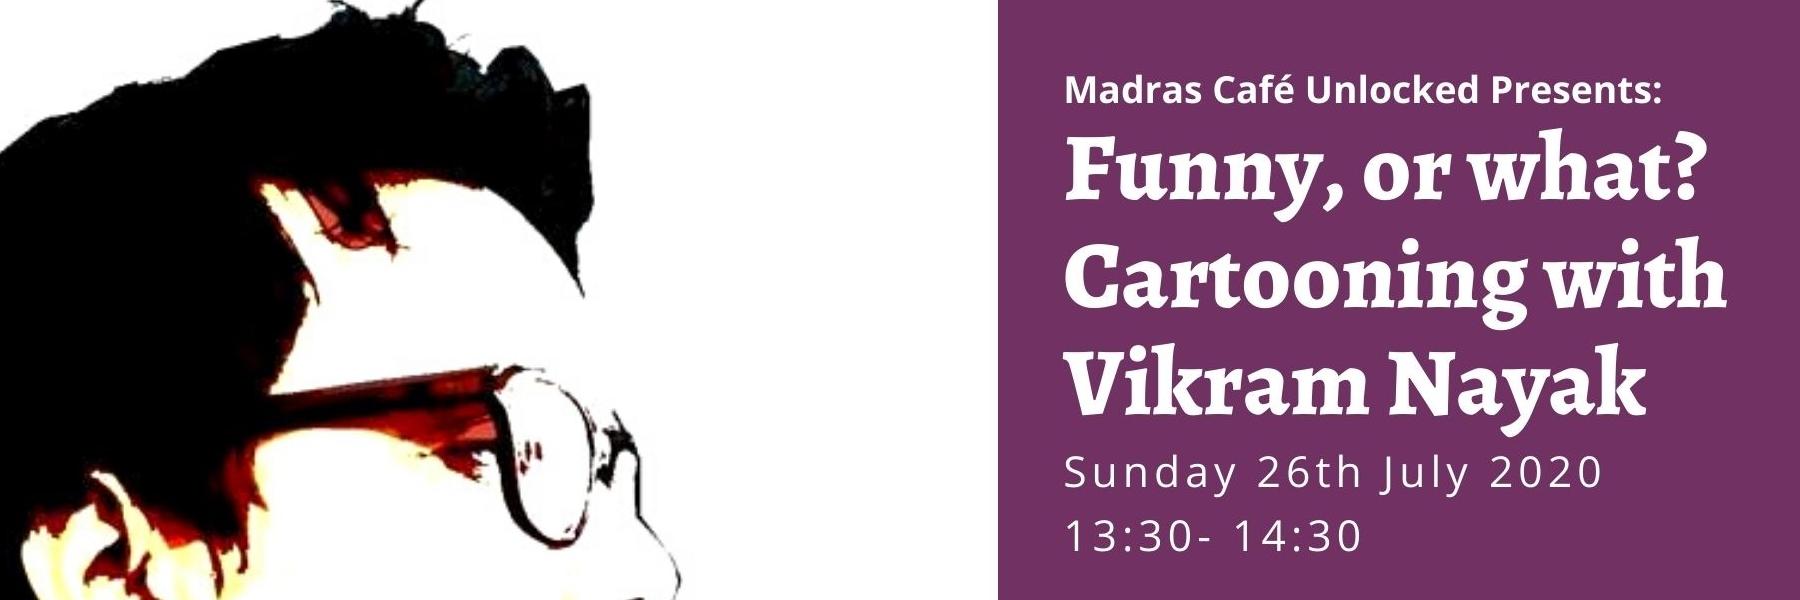 Madras Cafe Unlocked 2020: Funny or What: Cartooning with Vikram Nayak